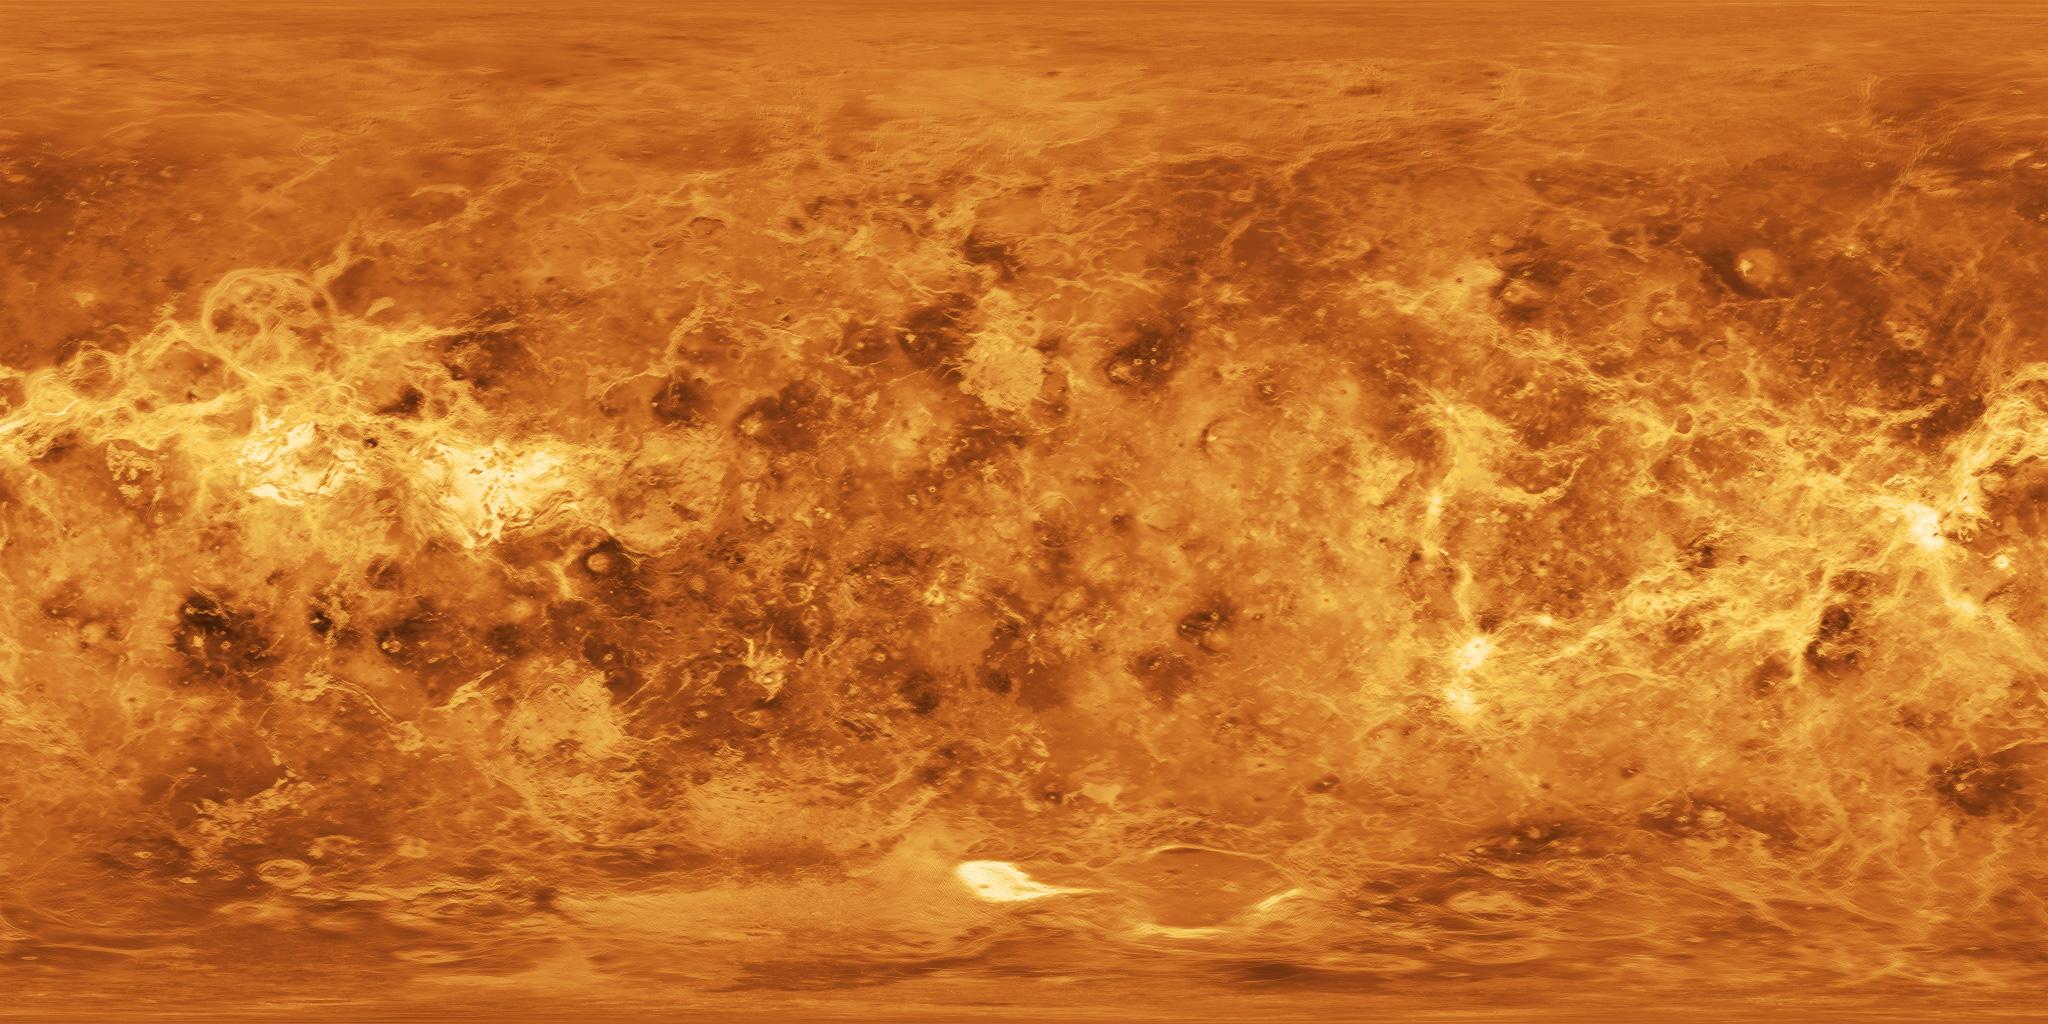 Solar Textures   Solar System Scope